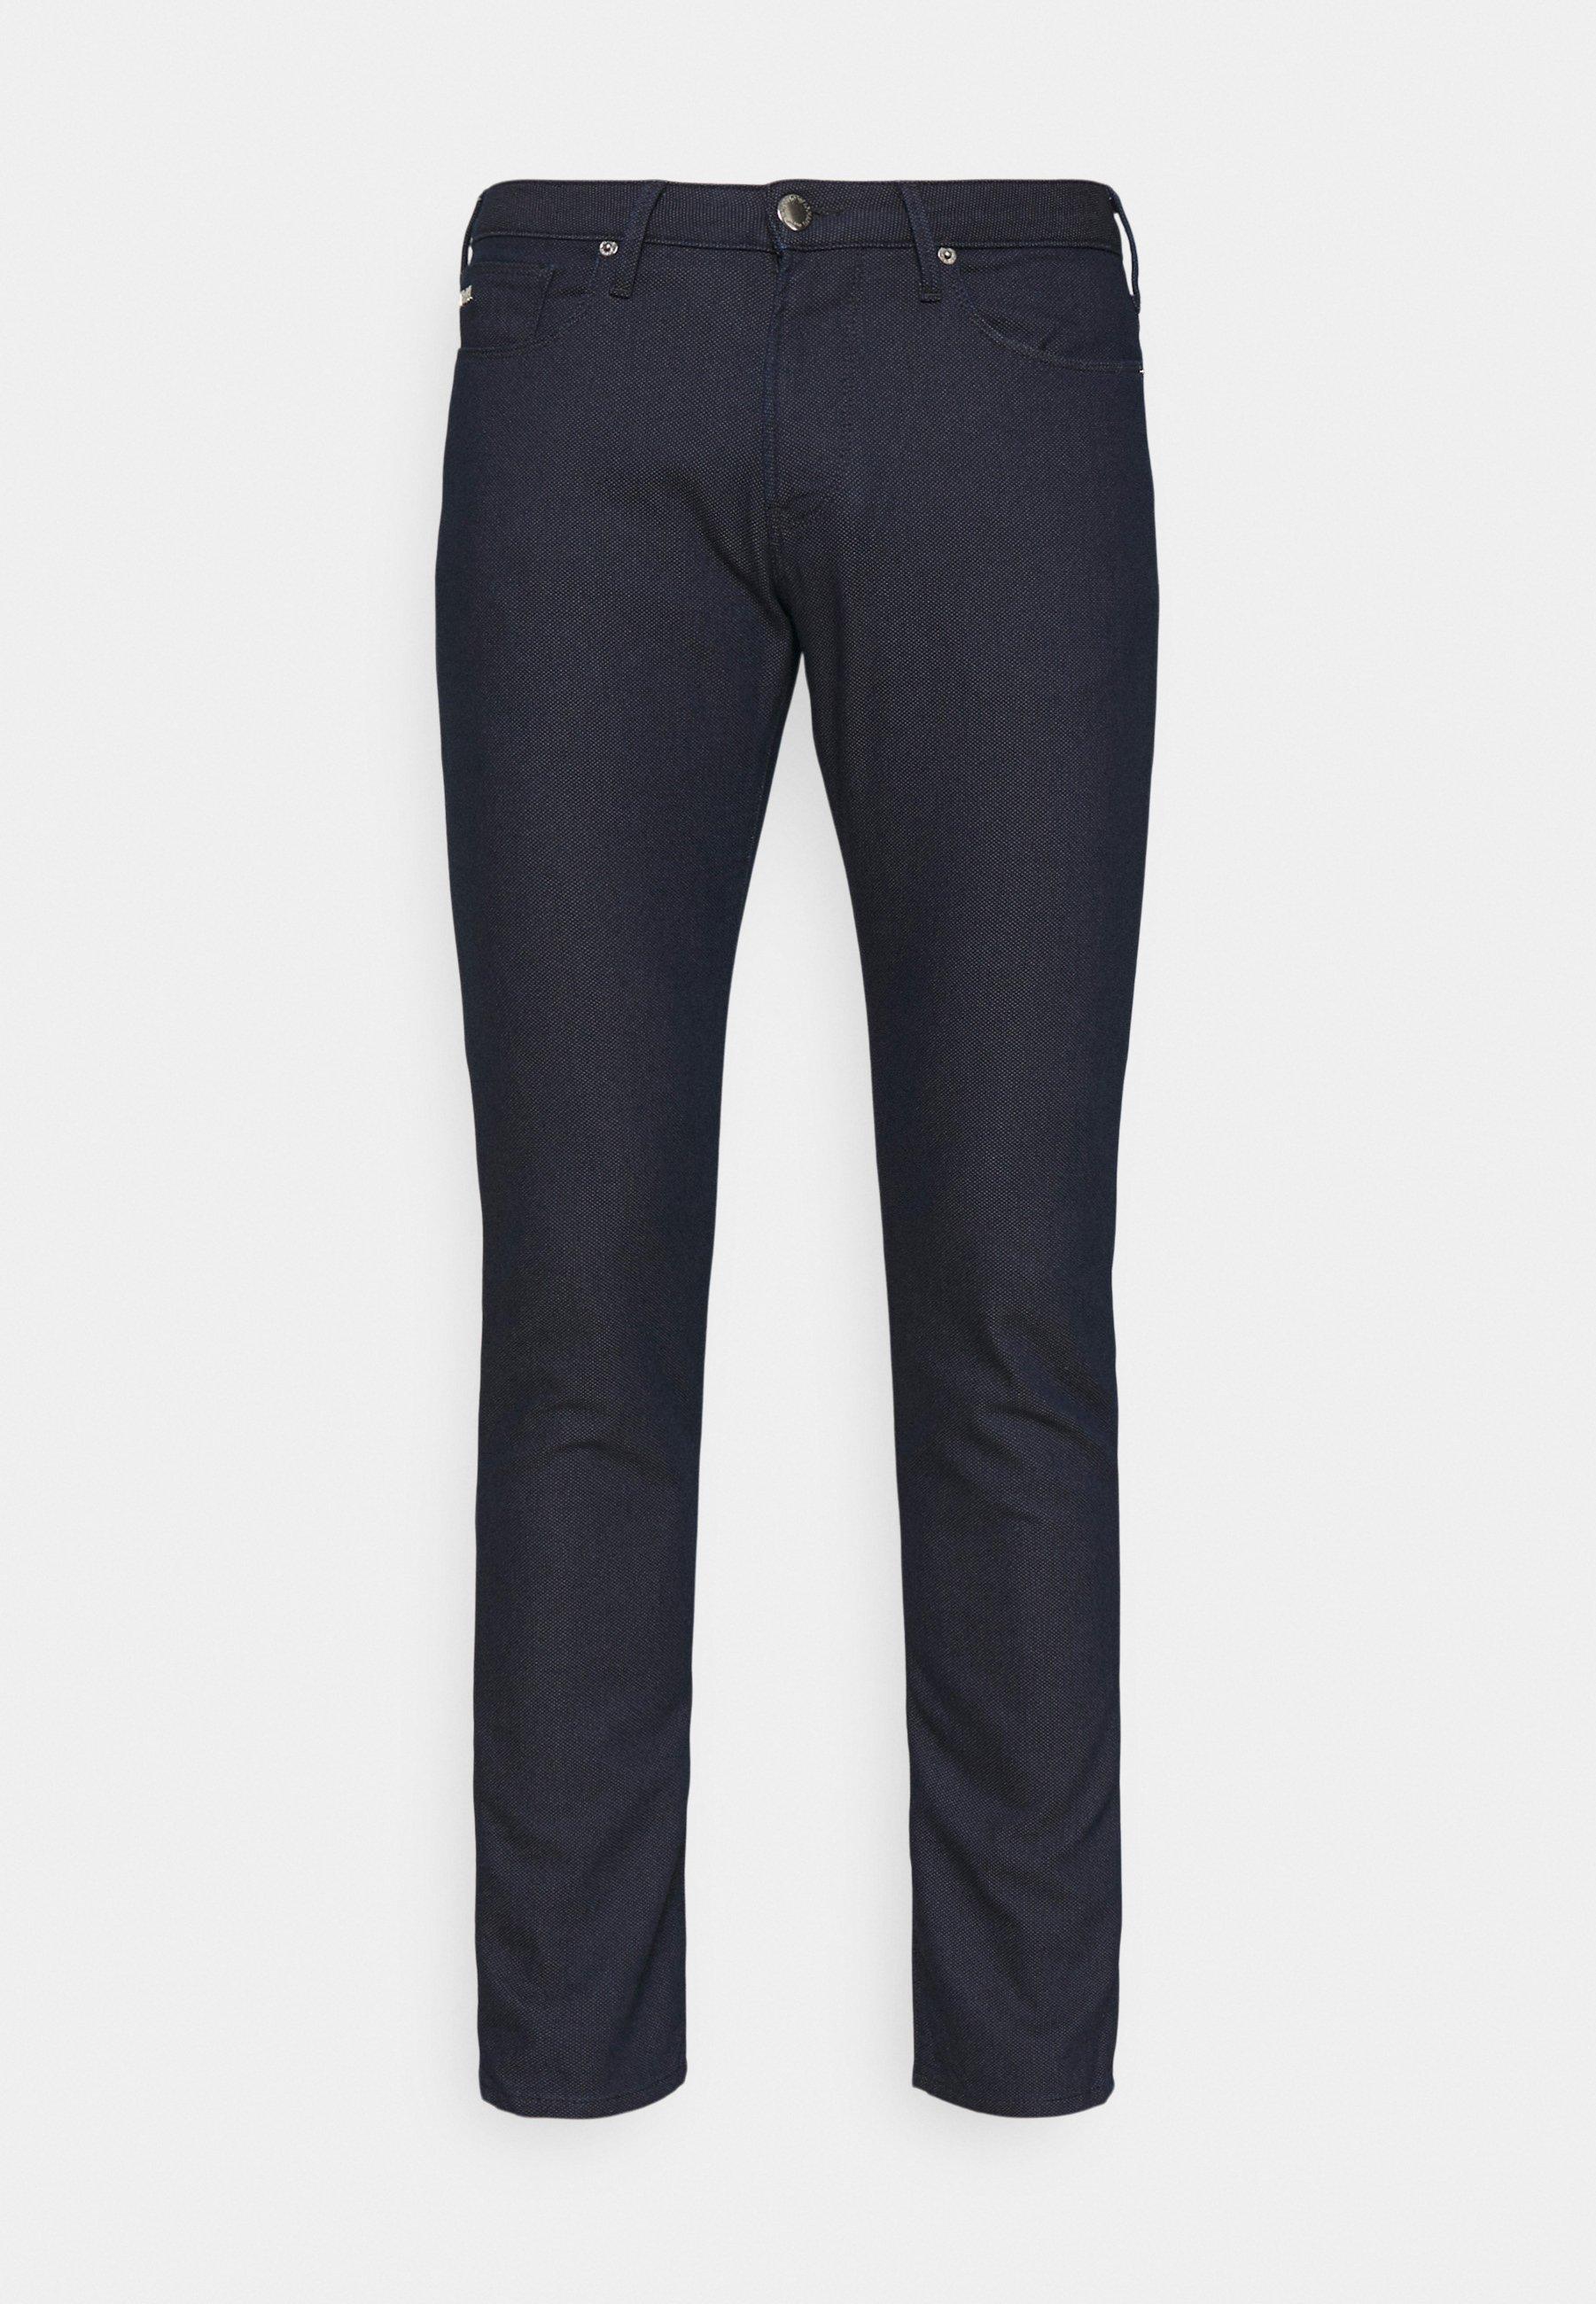 Uomo POCKETS PANT - Jeans slim fit